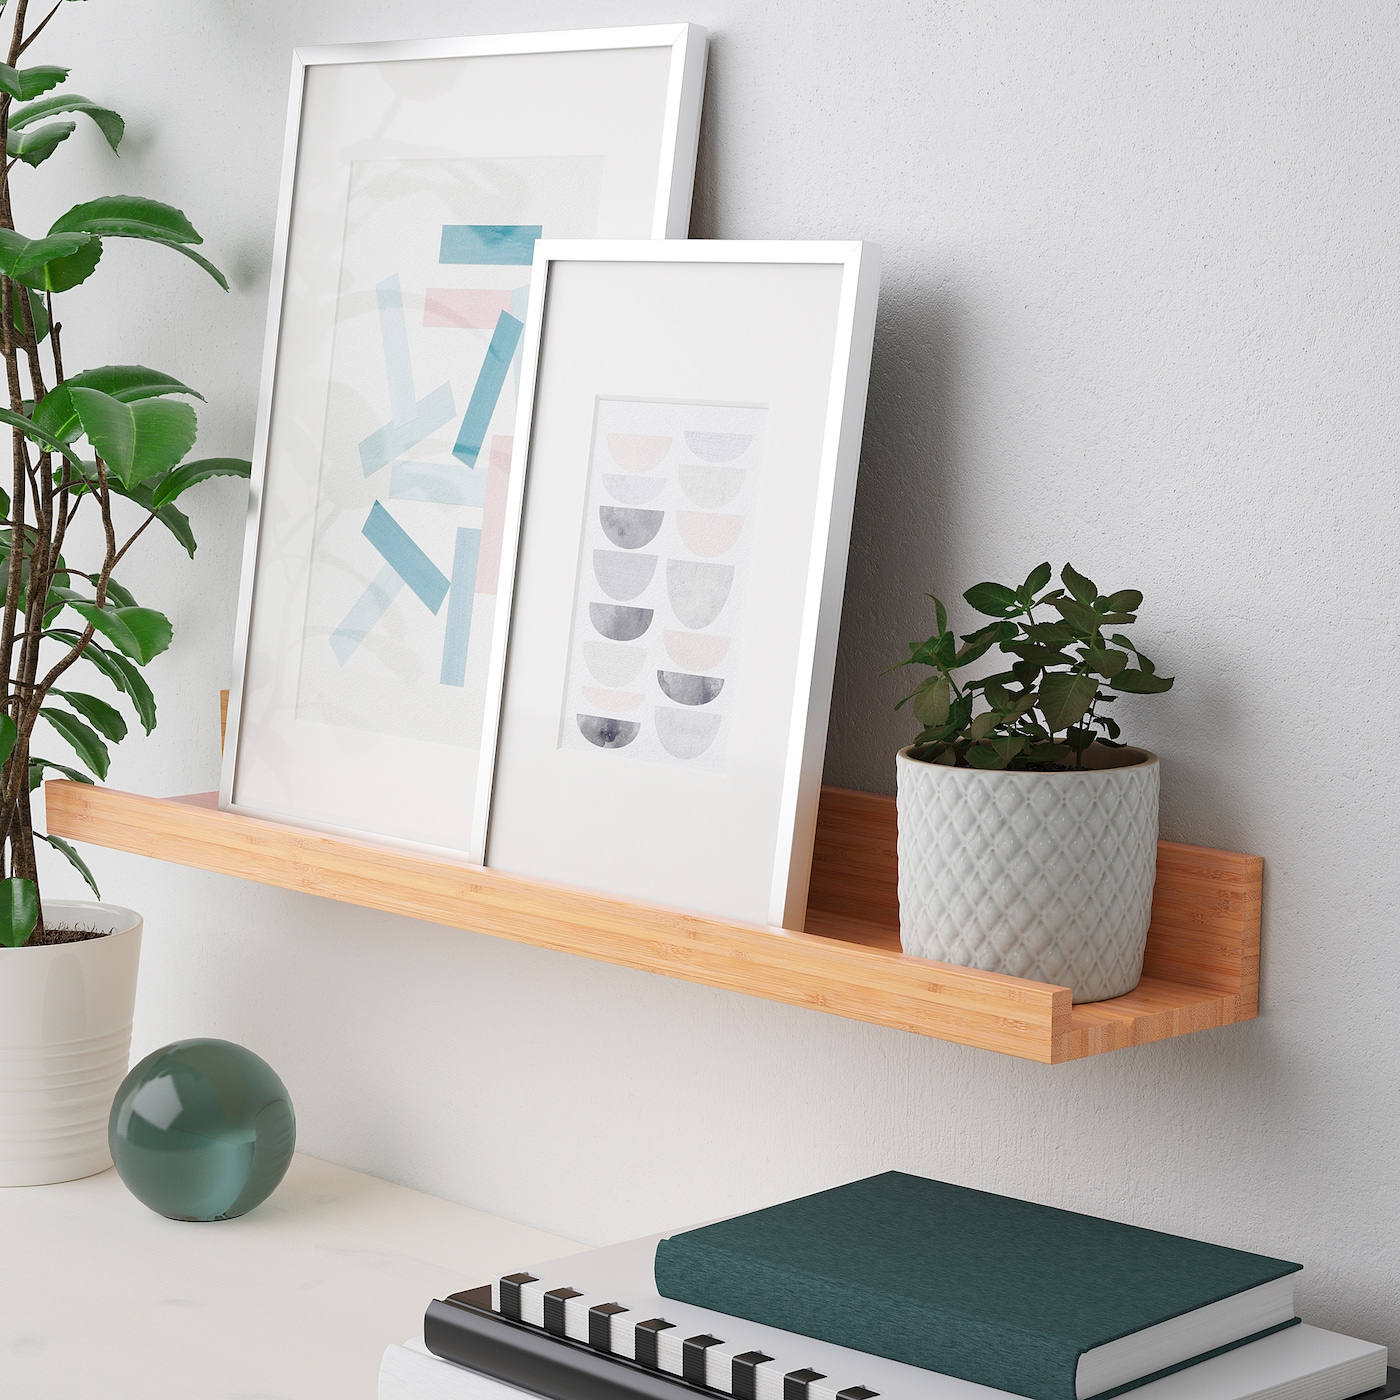 Cavalletti Per Quadri Ikea mÅlerÅs picture ledge - bamboo 75 cm